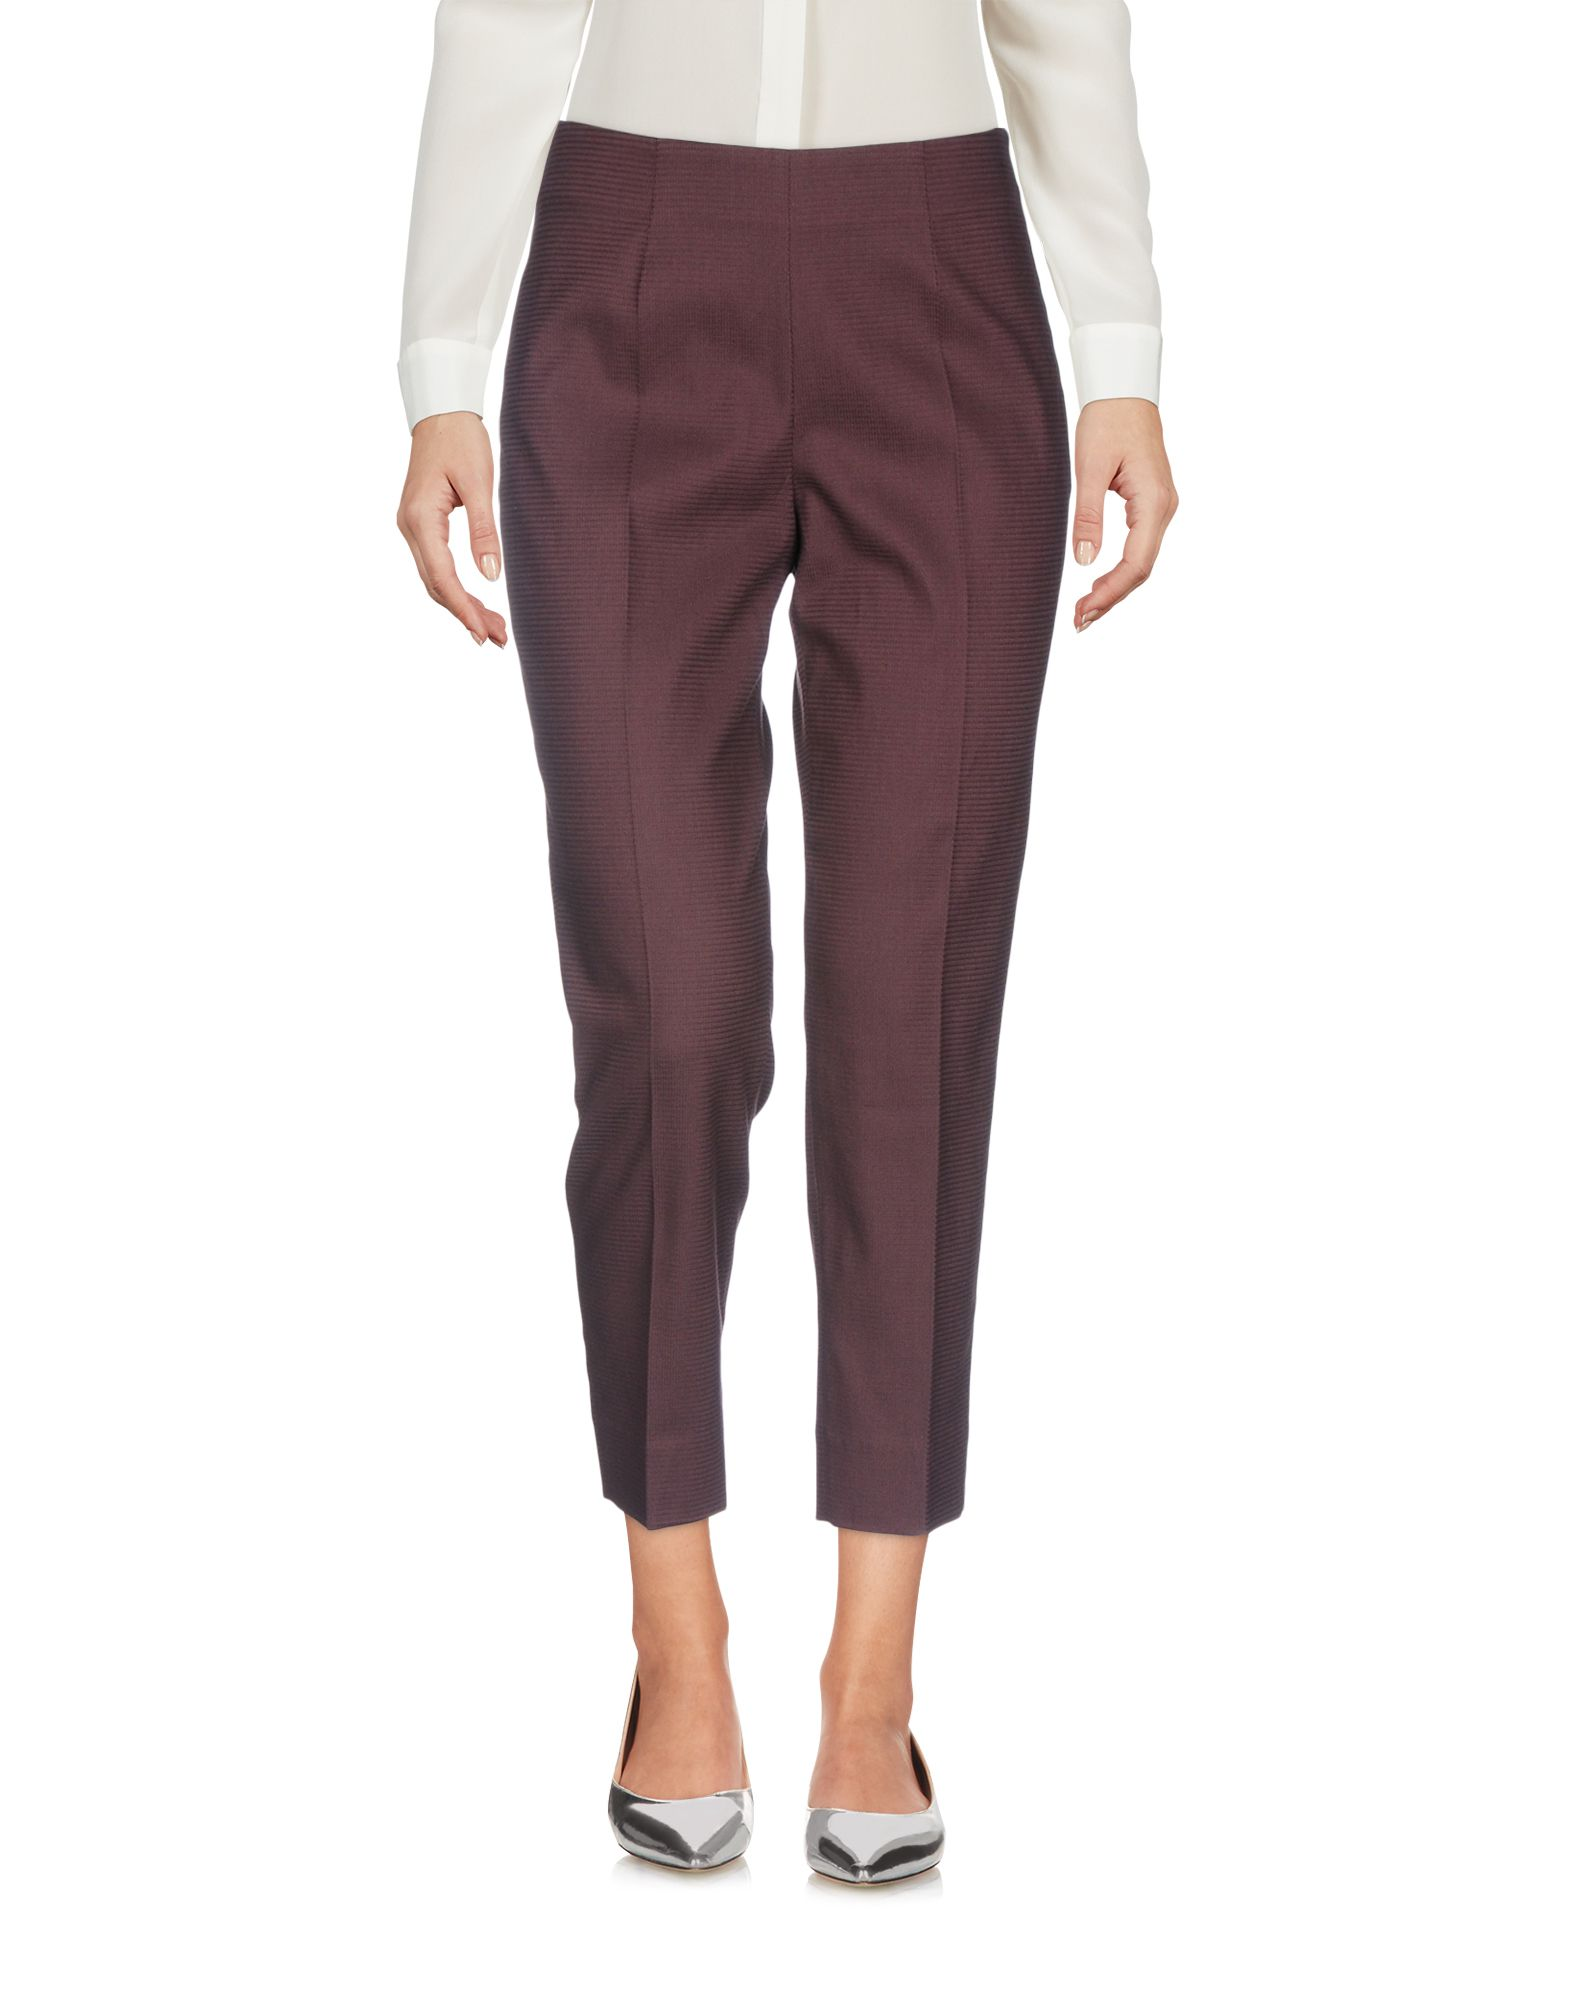 Pantalone Tapered Piazza Sempione Donna - Acquista online su J8UIVR